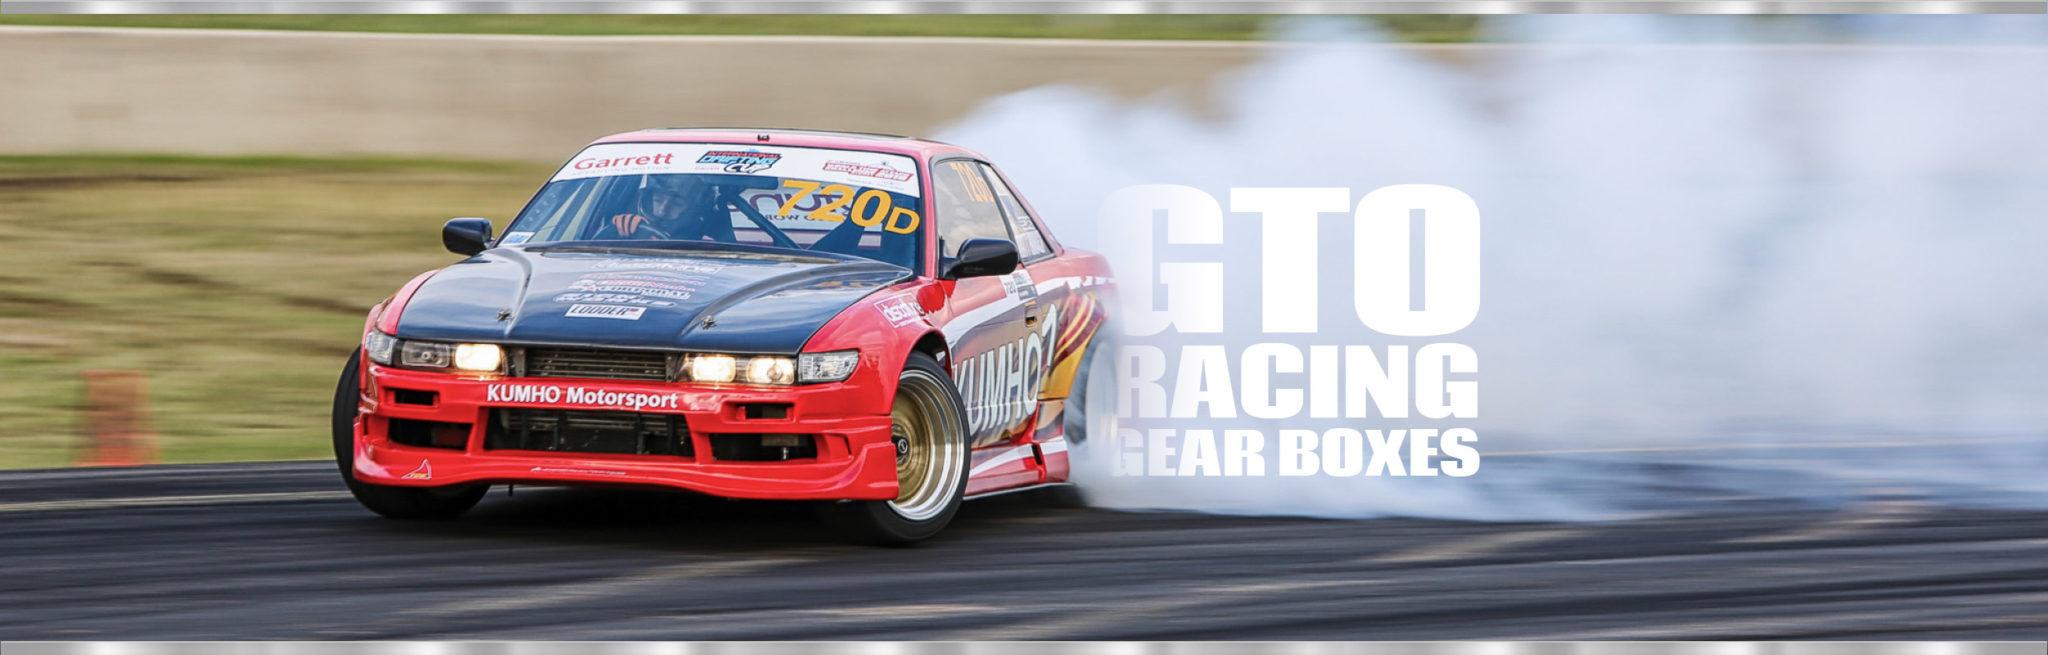 Car Gearboxes - TT Industries